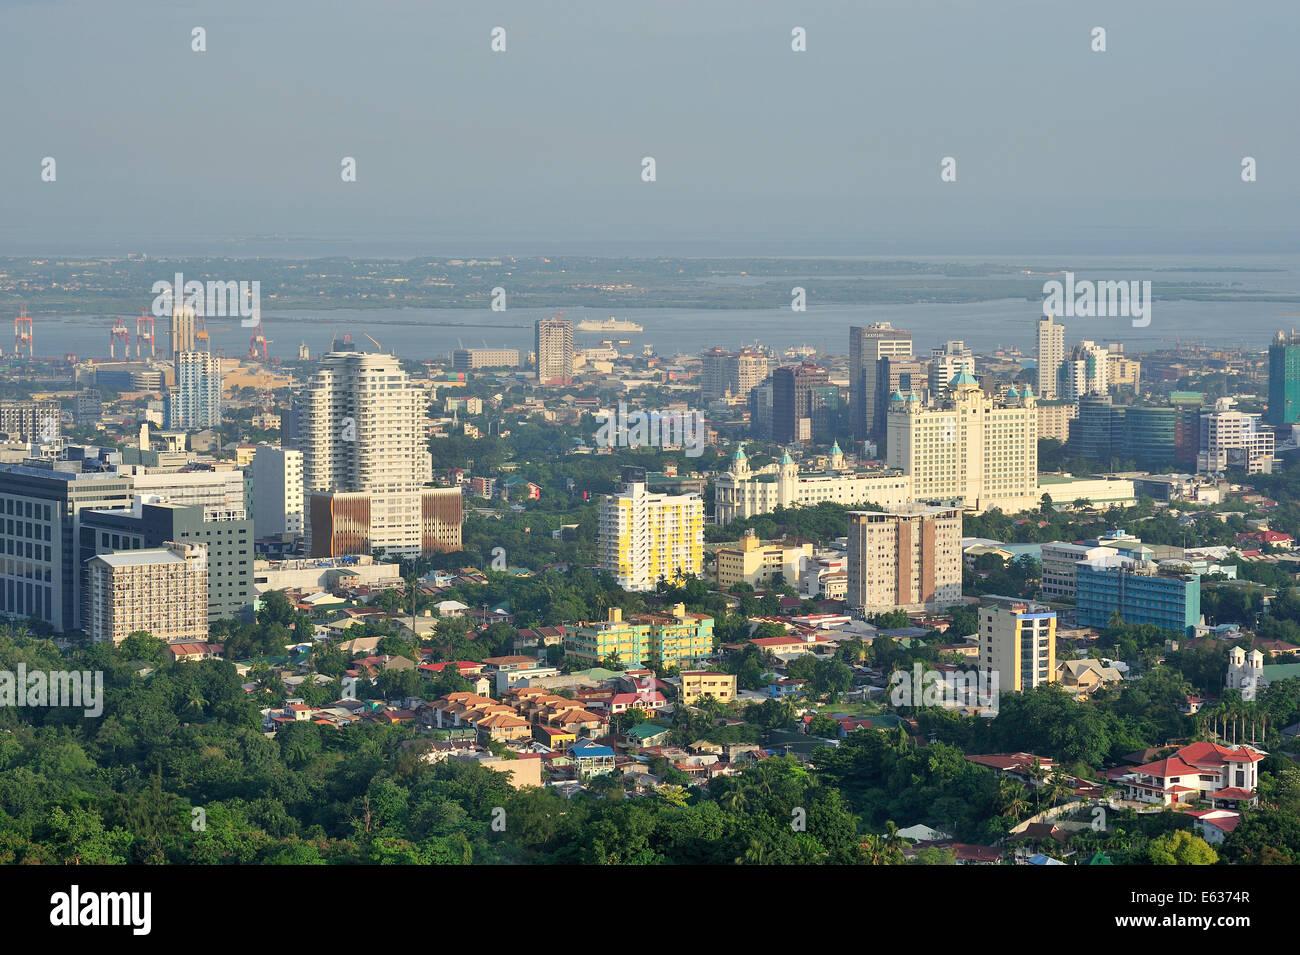 General View Cebu City Philippines - Stock Image